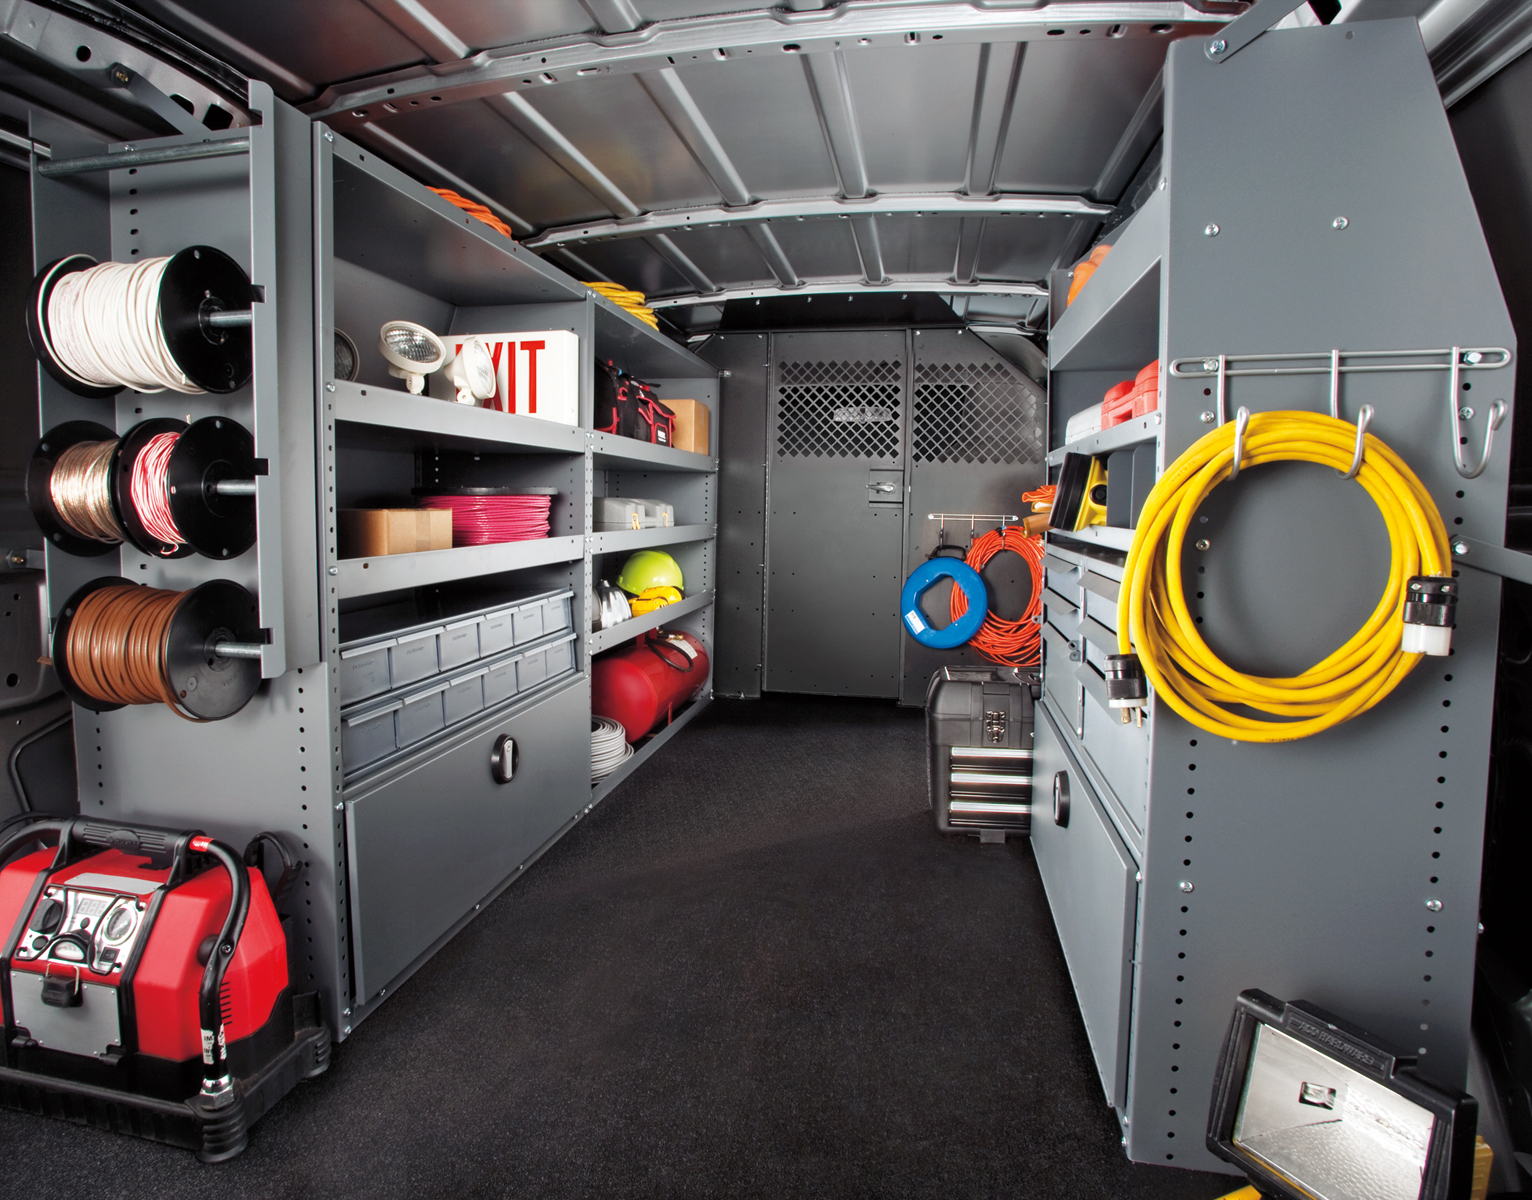 7 Factors To Consider When Upfitting Cargo Vans Operations